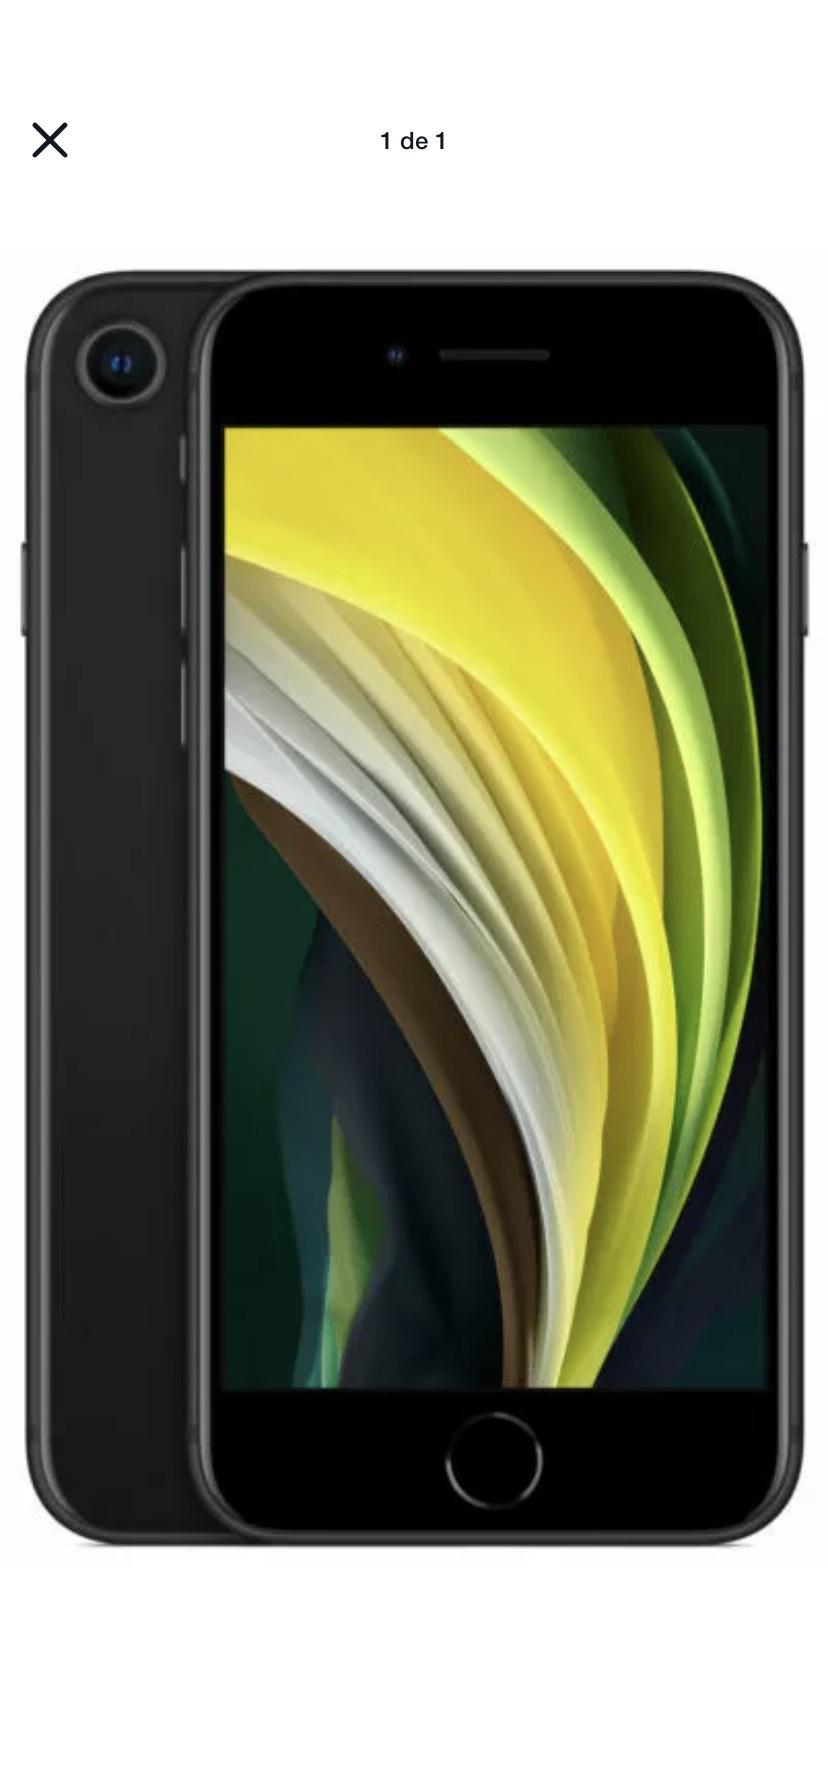 Apple iPhone SE 2.ª gen - 64GB - Negro, Garantía, envió desde España